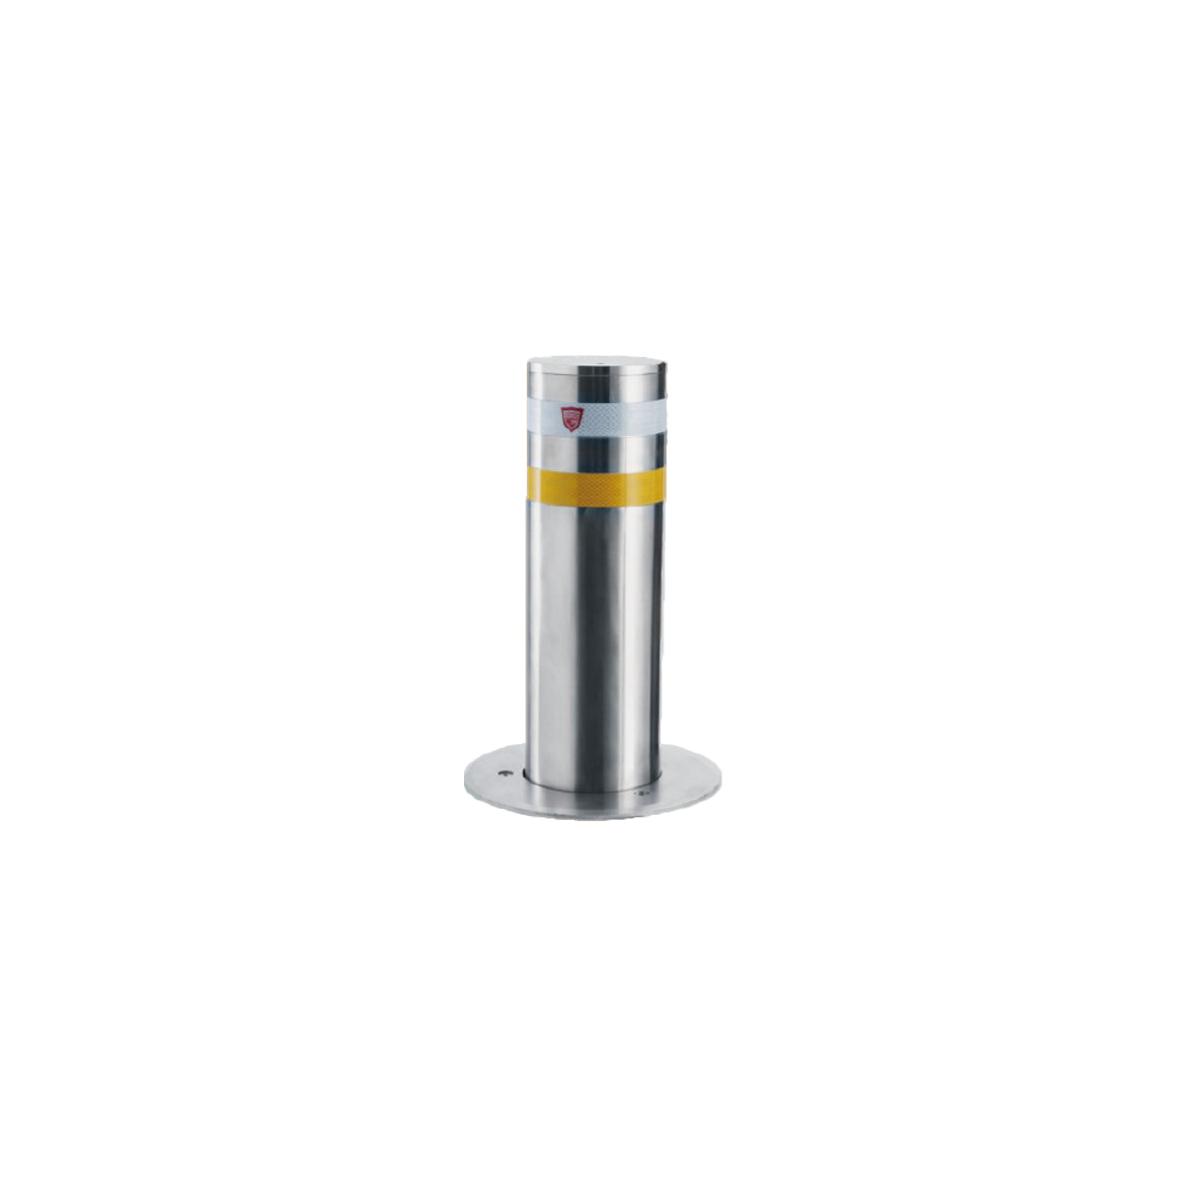 Stainless Steel Bollard - Semi Automatic